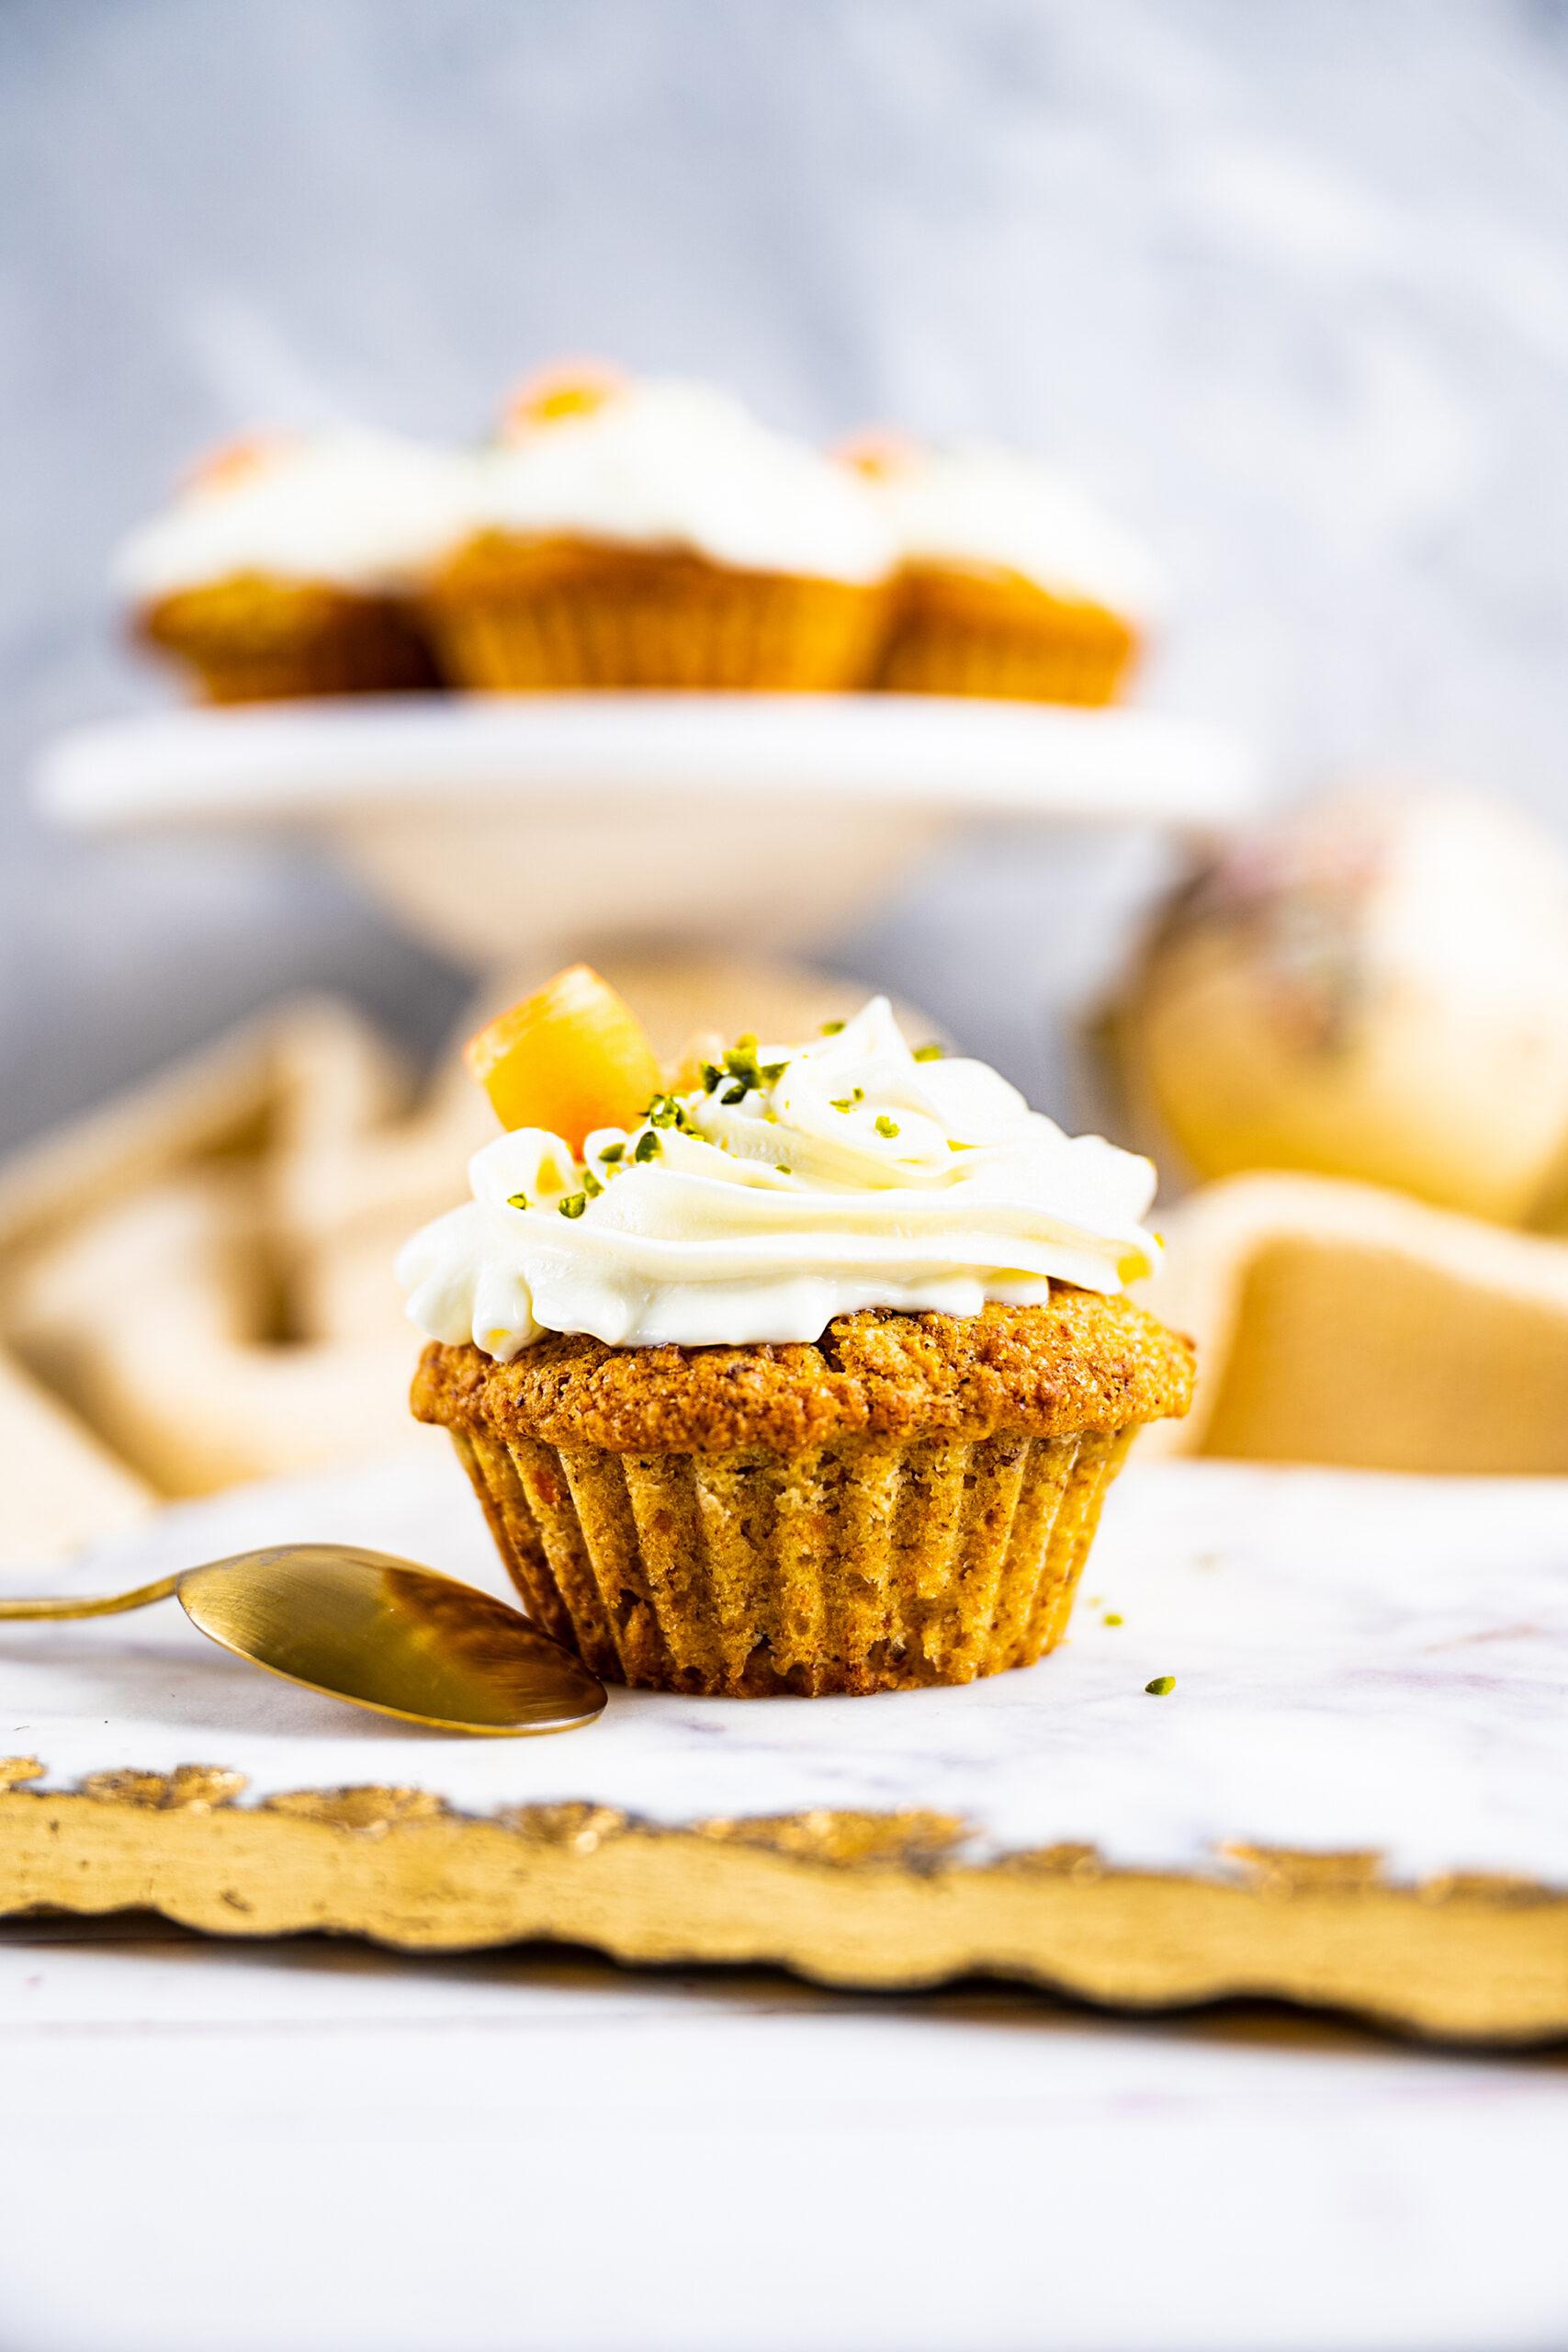 Die Schweiz lässt grüßen: Rübli-Cupcakes